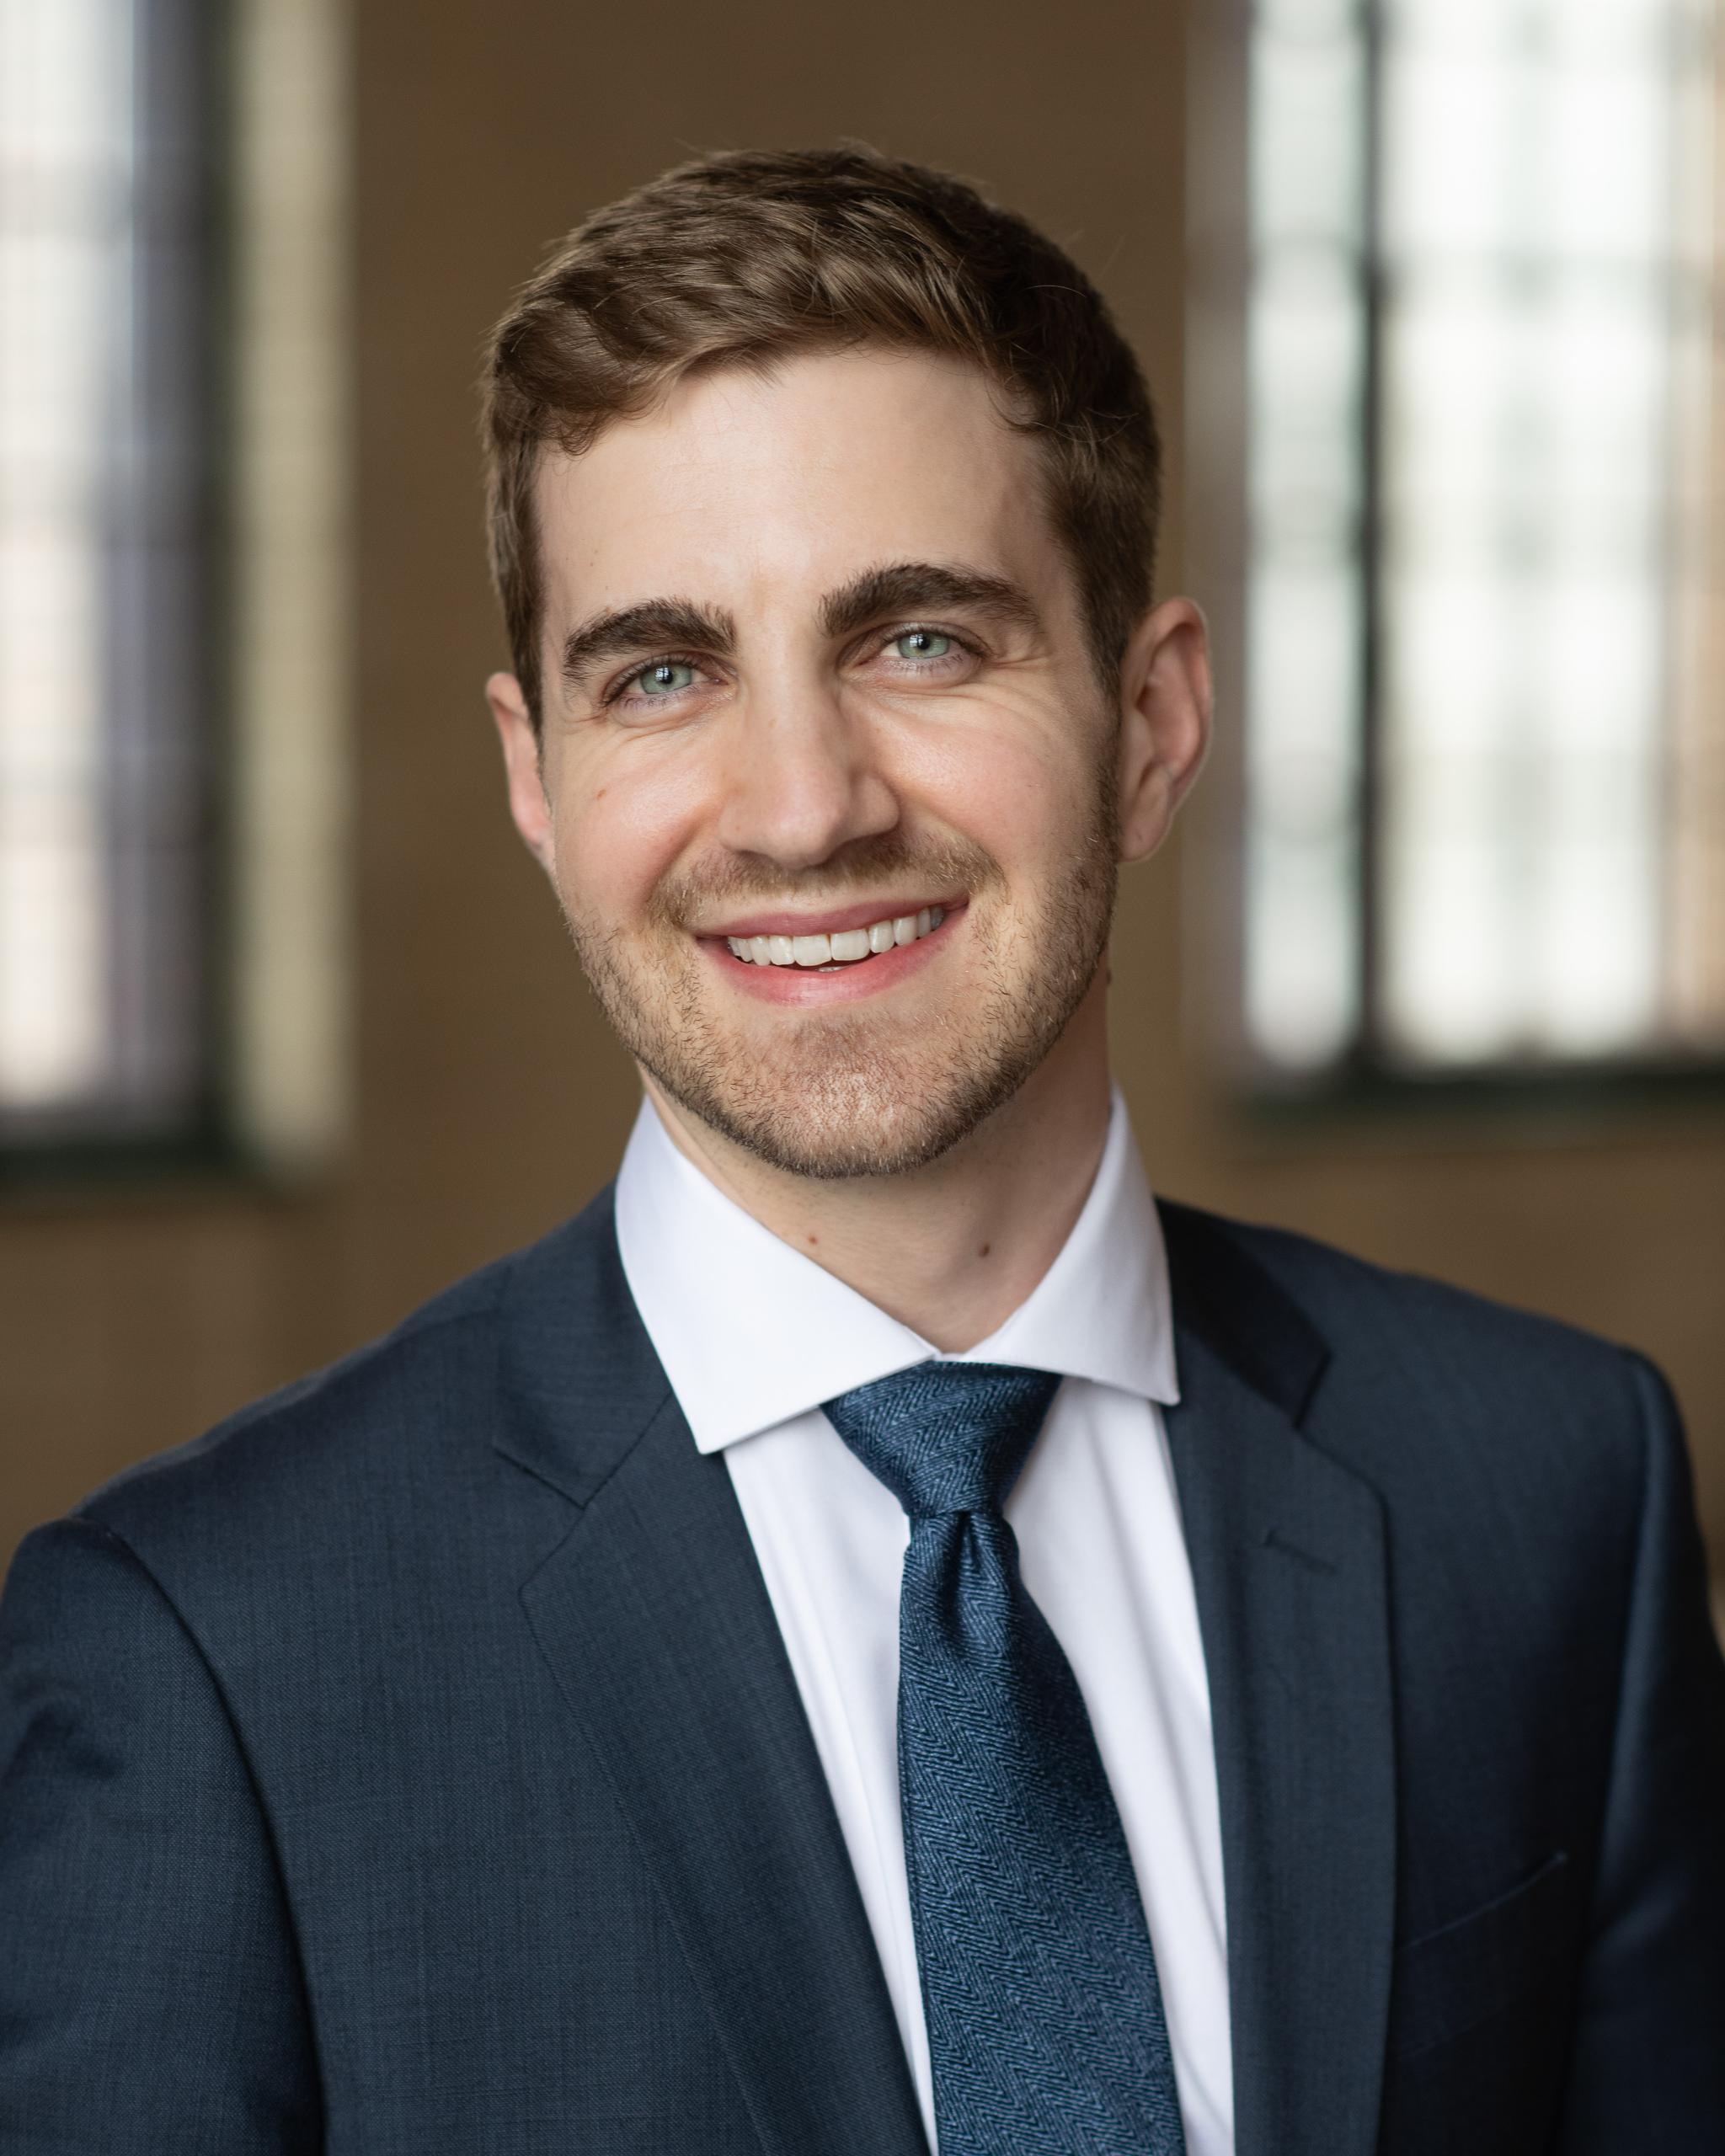 Image of Blake Gimbel, PhD, Postdoctoral Fellow